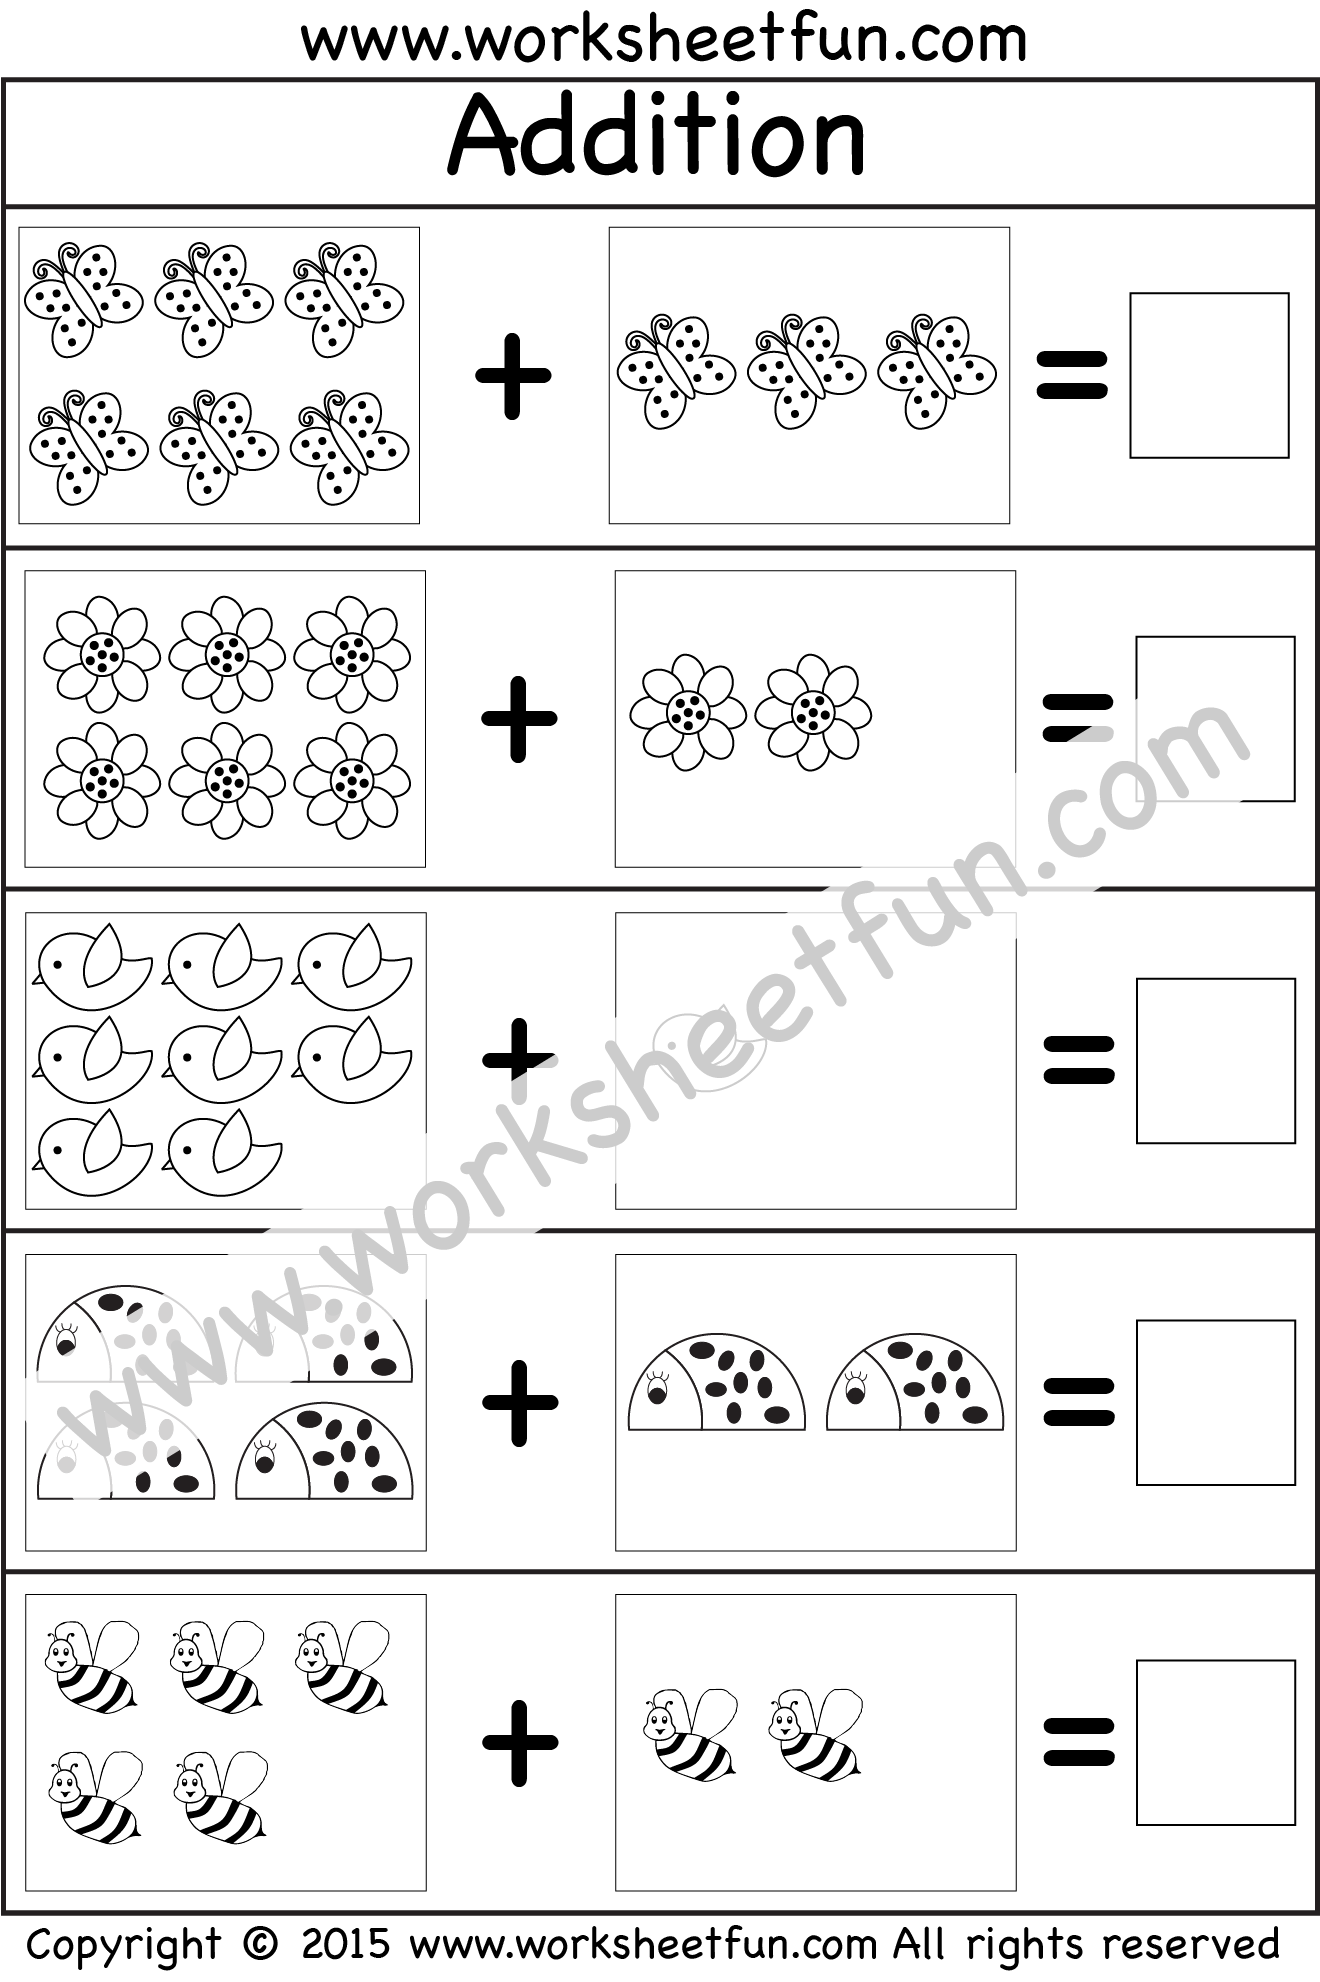 Kindergarten Addition Worksheet Kindergarten Addition Worksheets Addition Worksheets Addition Kindergarten [ 1982 x 1320 Pixel ]